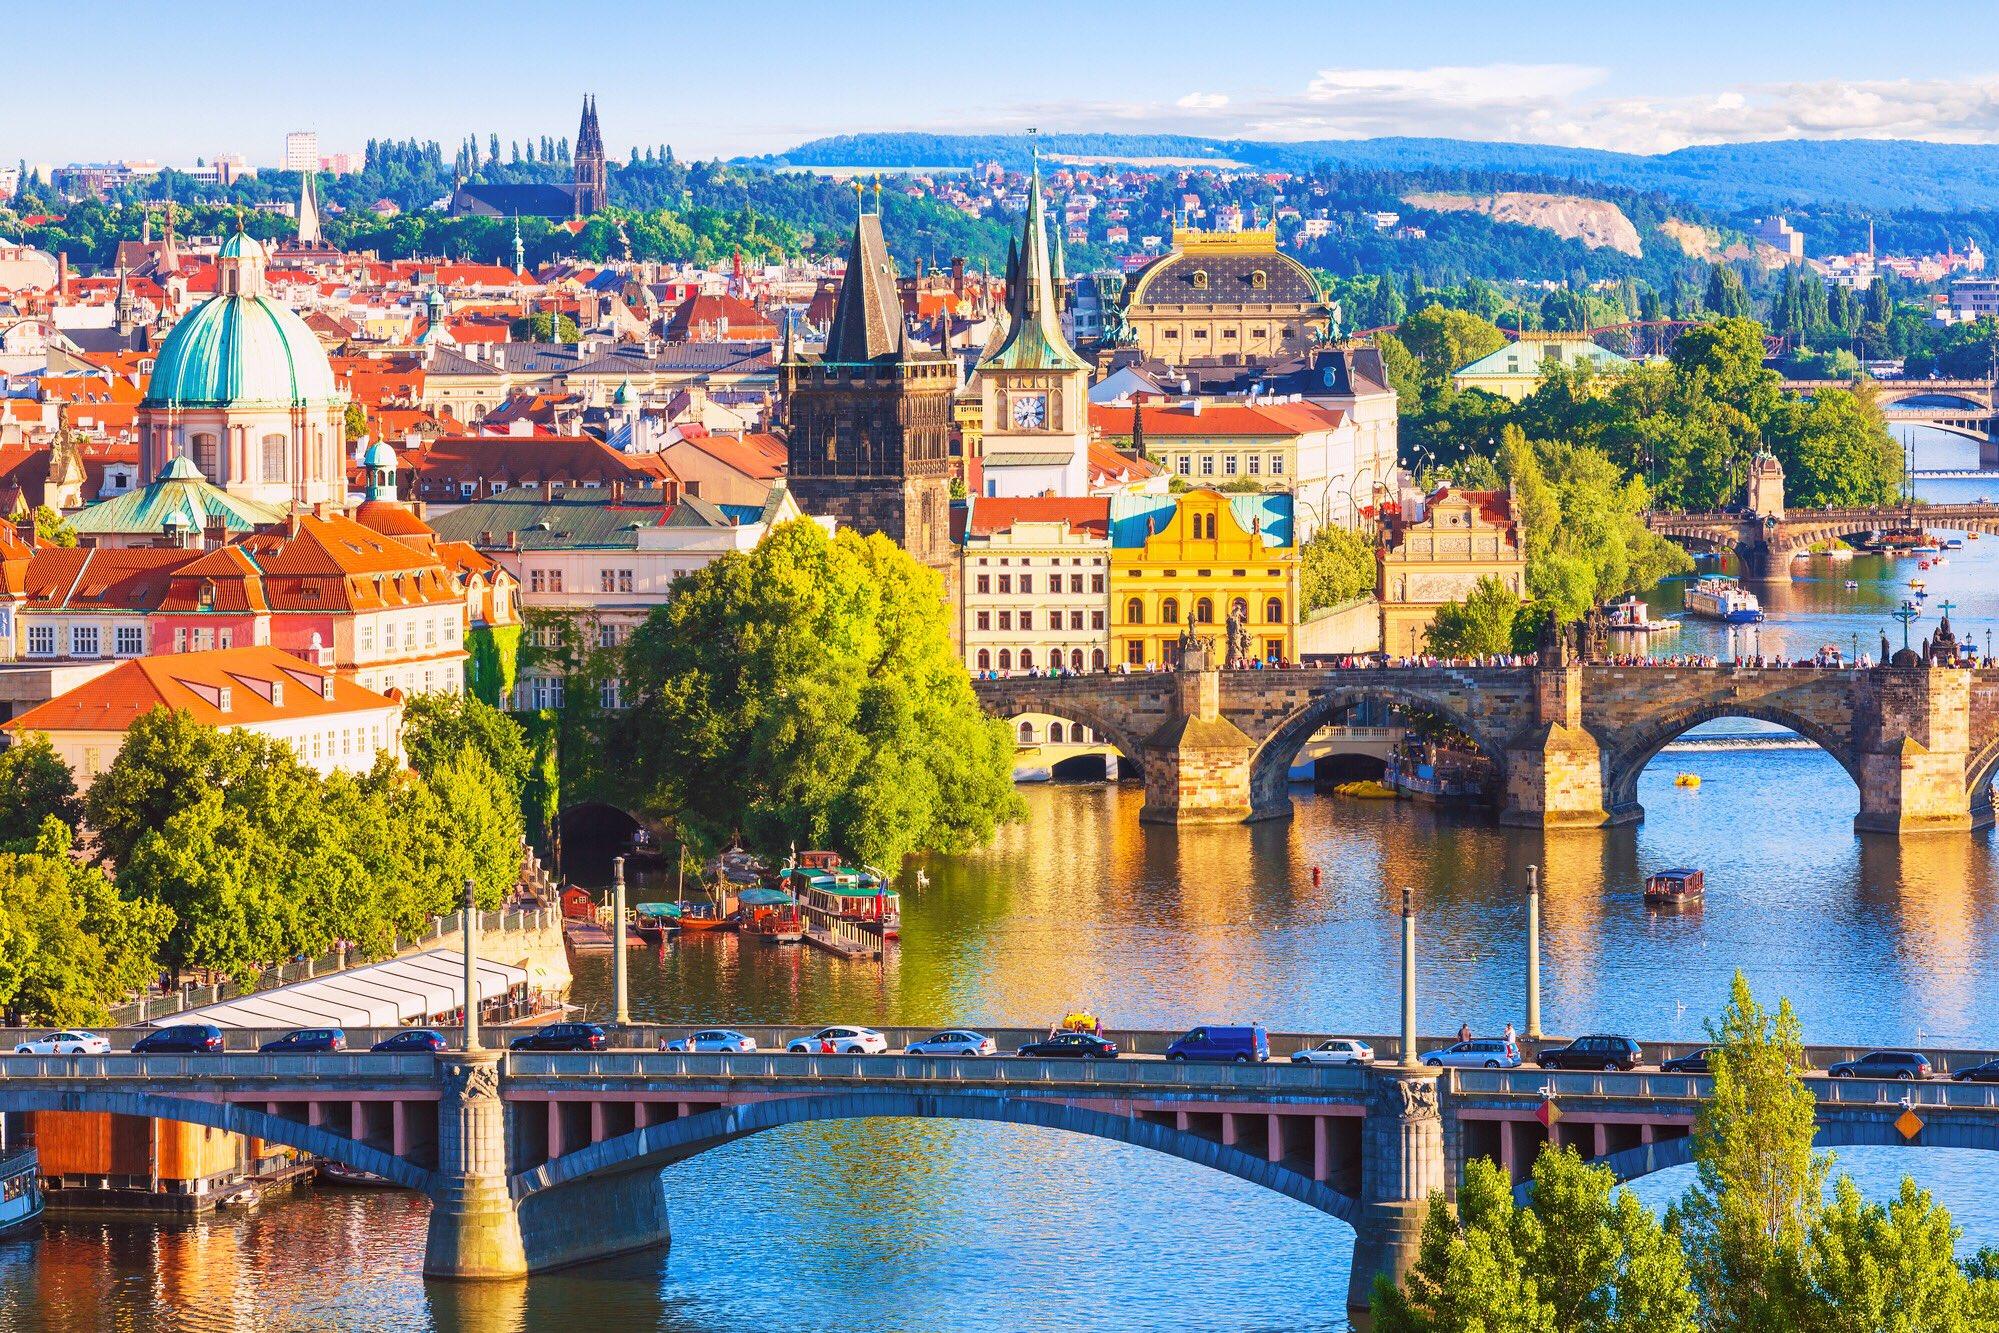 Bridges of Prague, #Czechia https://t.co/yoh0abd9TE